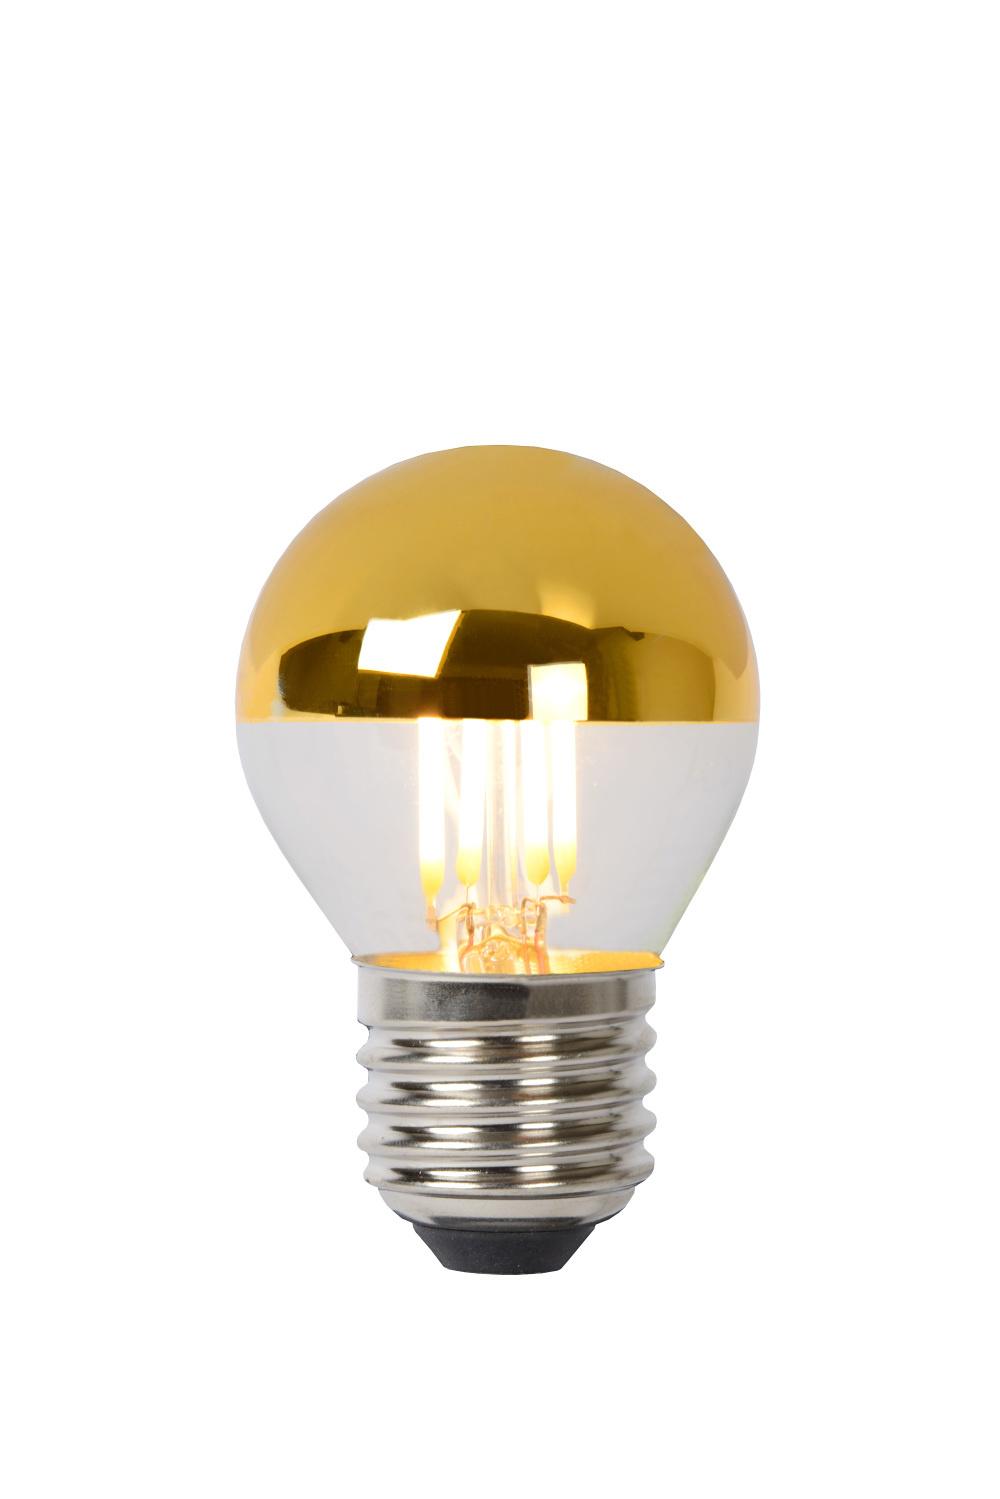 Lucide Lamp G45 Filament Dimbaar E27 4w 320lm 2700k Goud